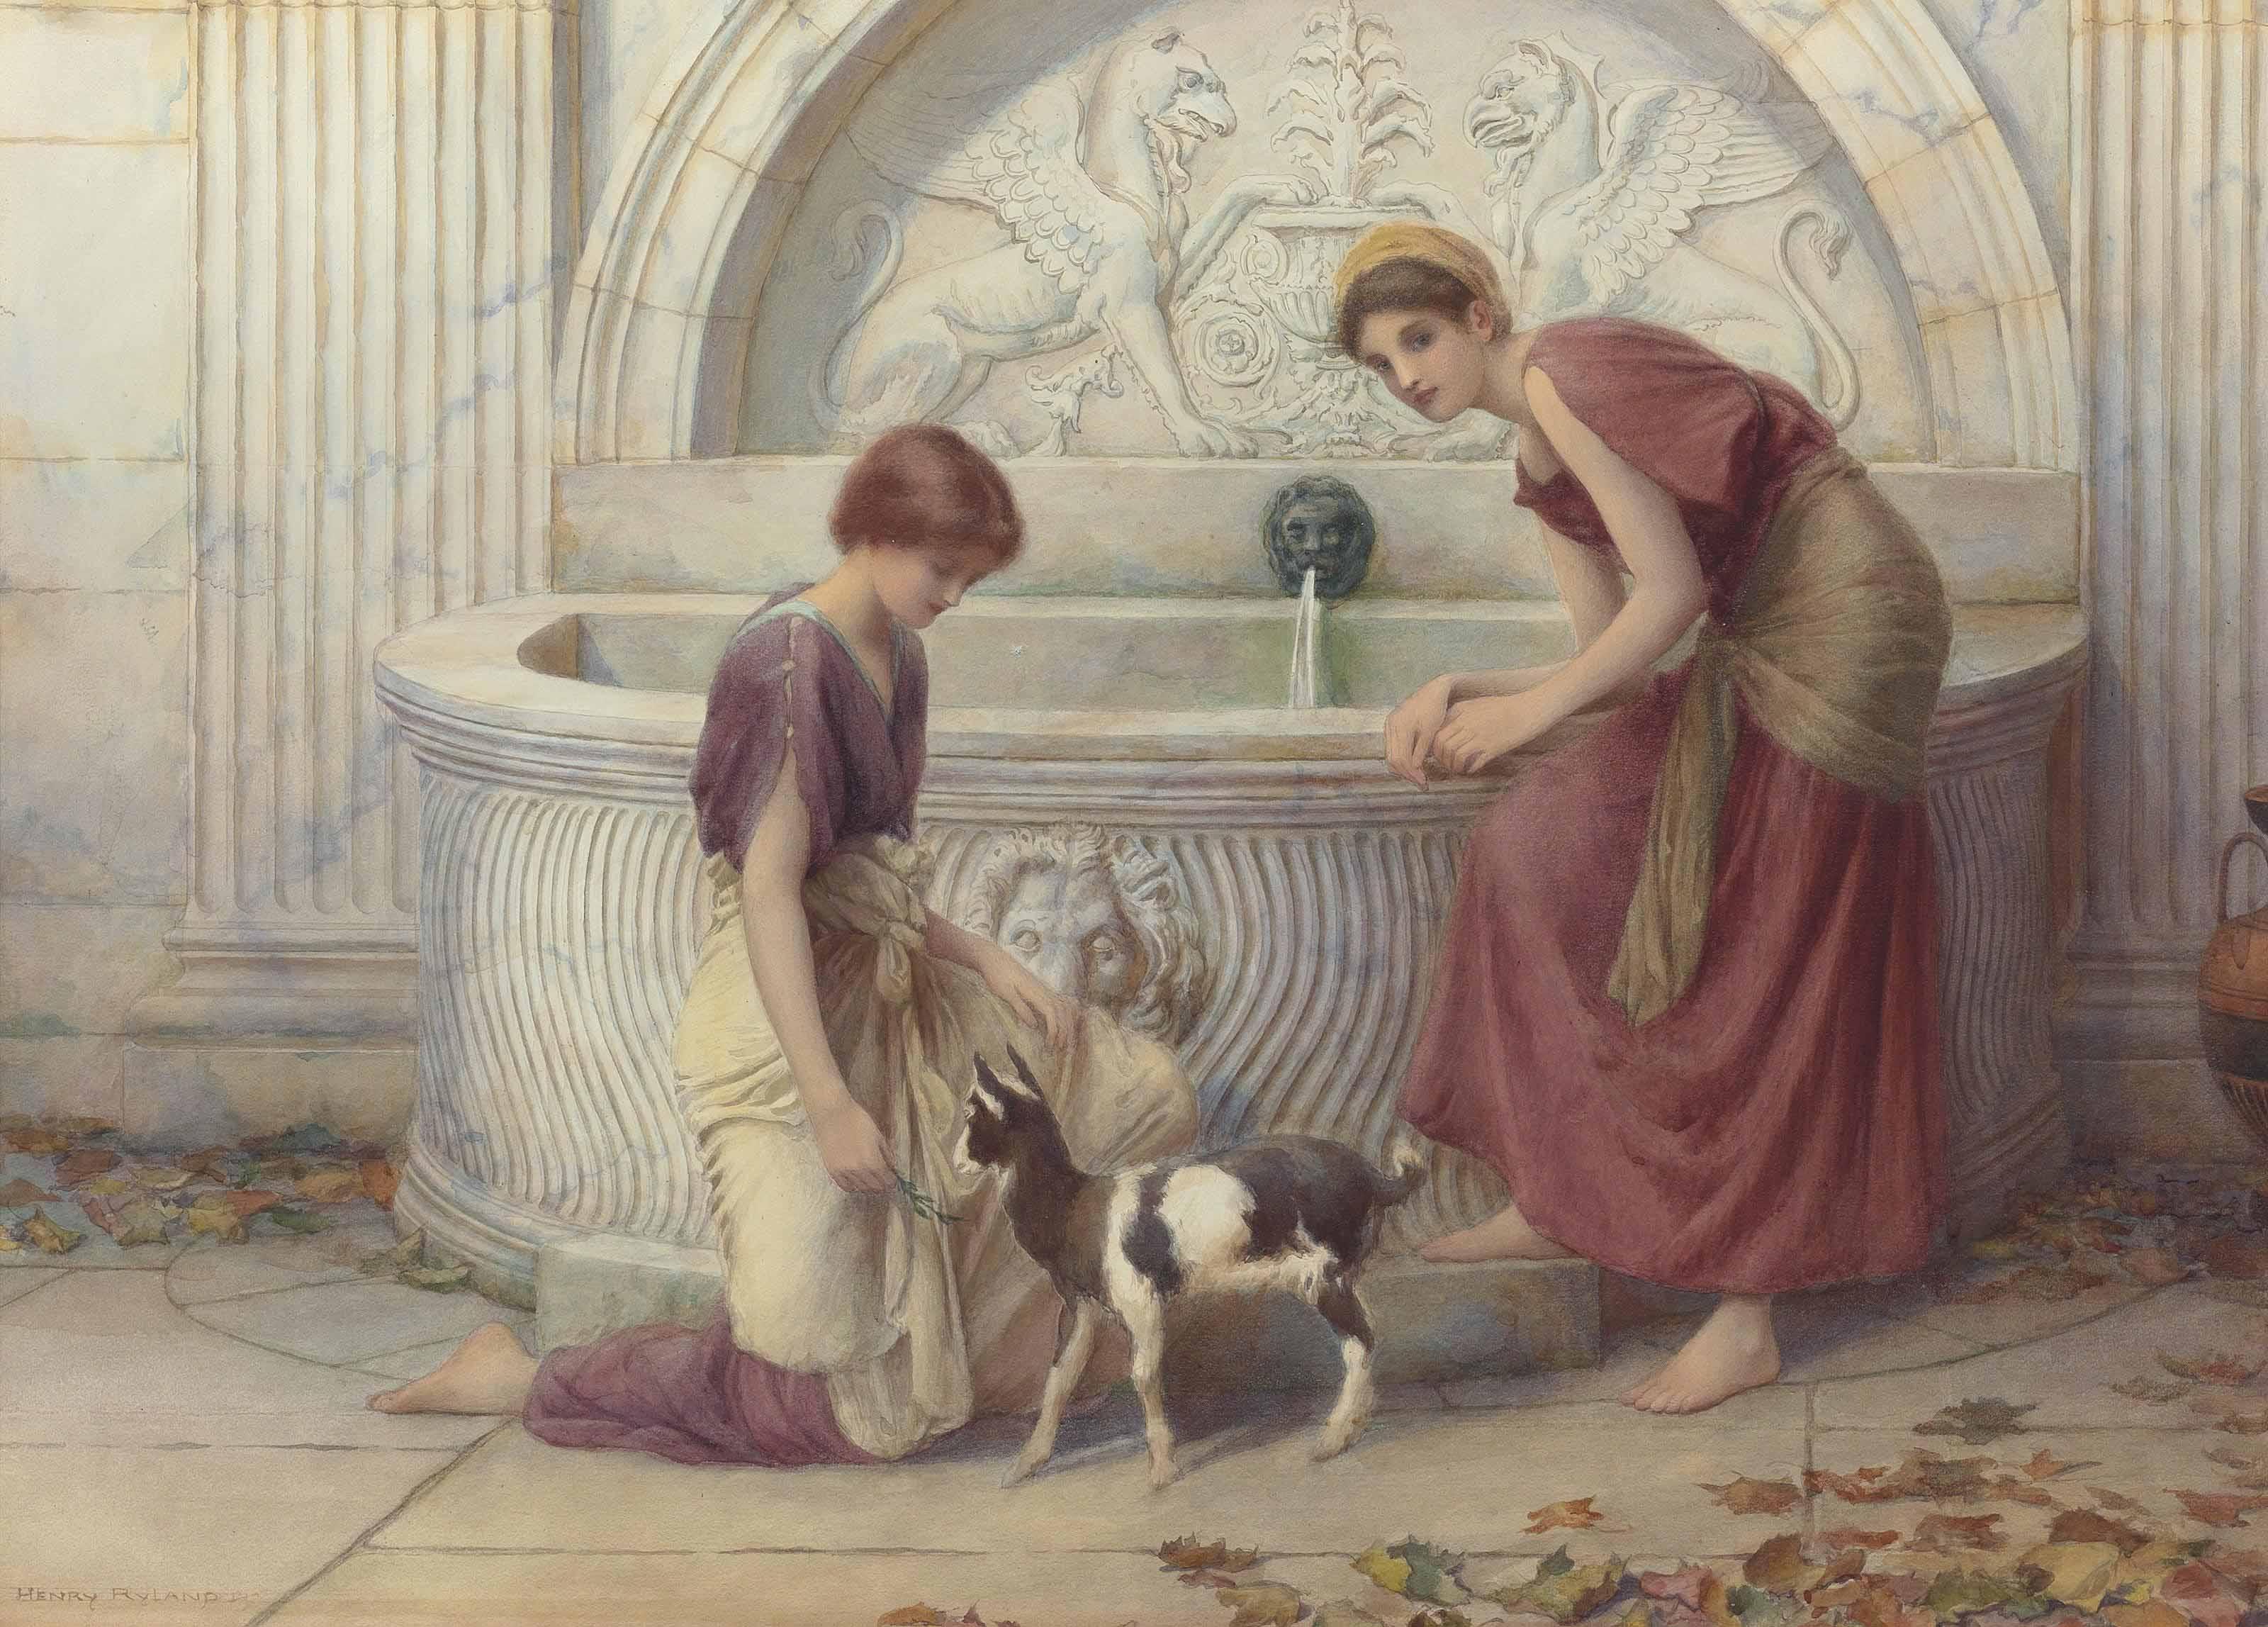 At the fountain, Autumn